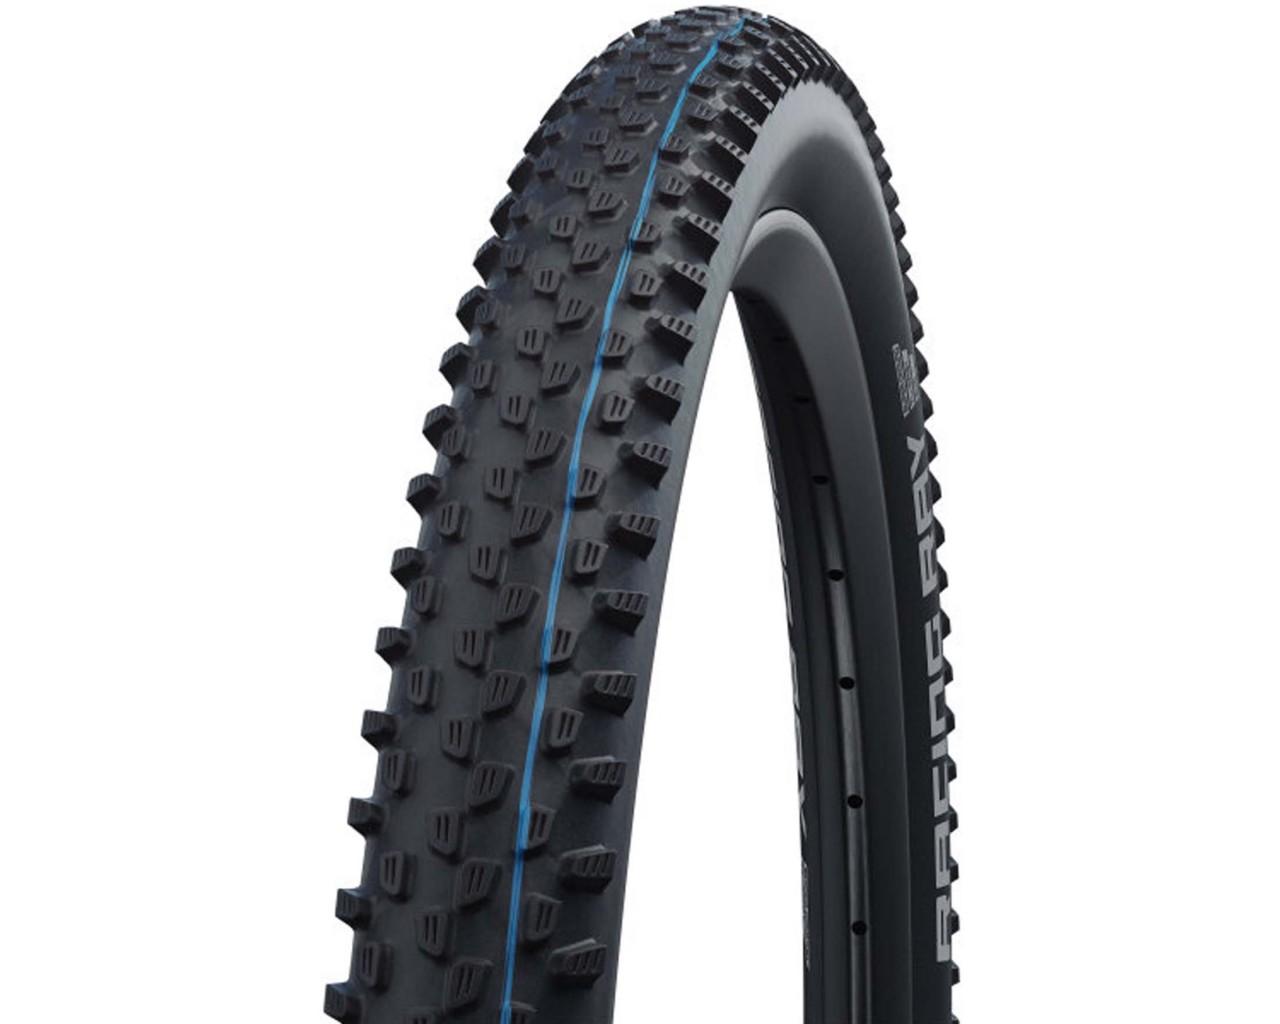 Schwalbe Racing Ray MTB-Tire 29x2.25 inch | black Addix Speed Evolution Line foldable